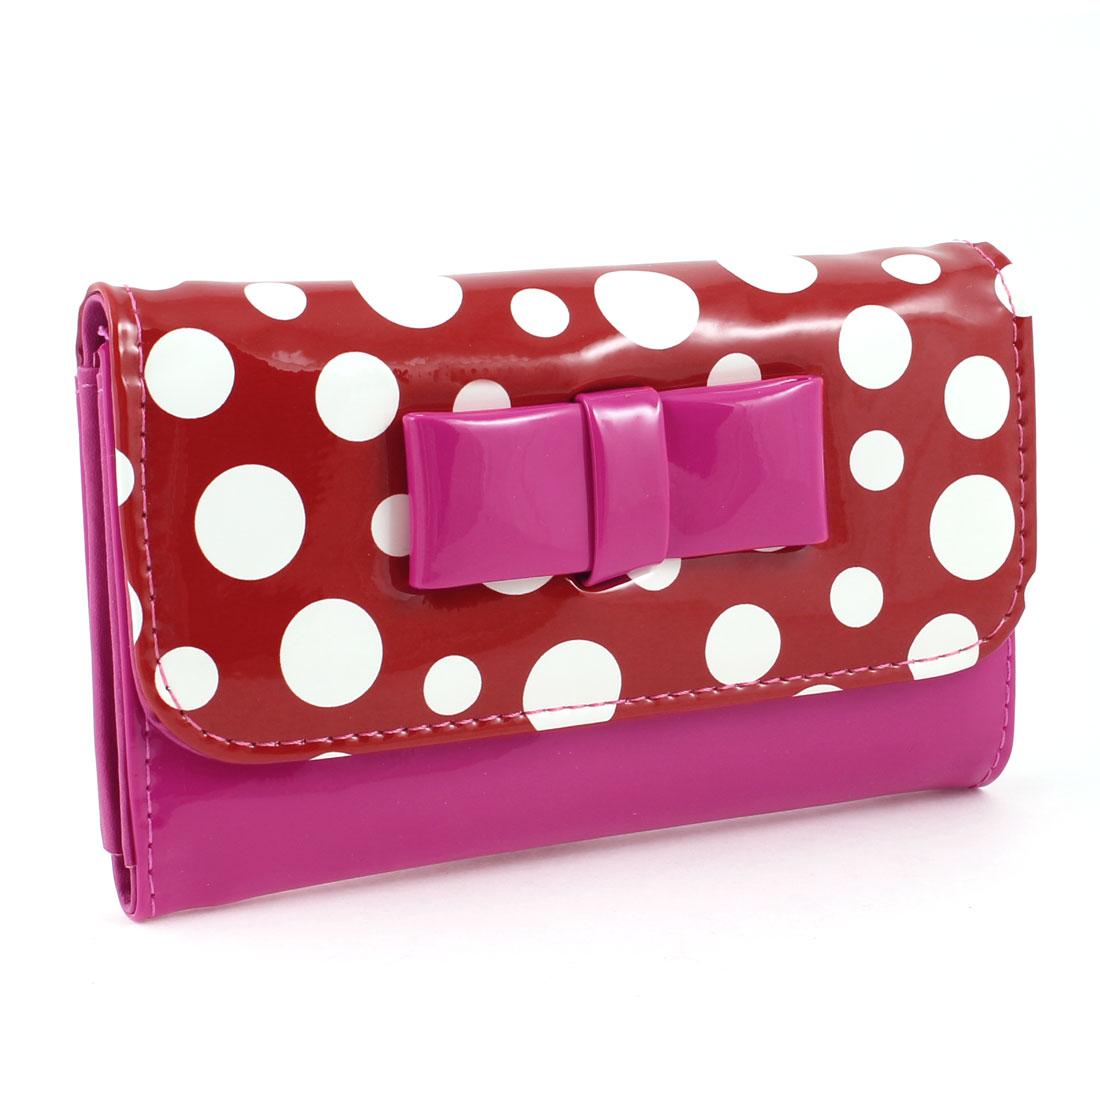 Dot Print Press Stud Button Fuchsia Rectangle 2 Slots Wallet Purse for Women